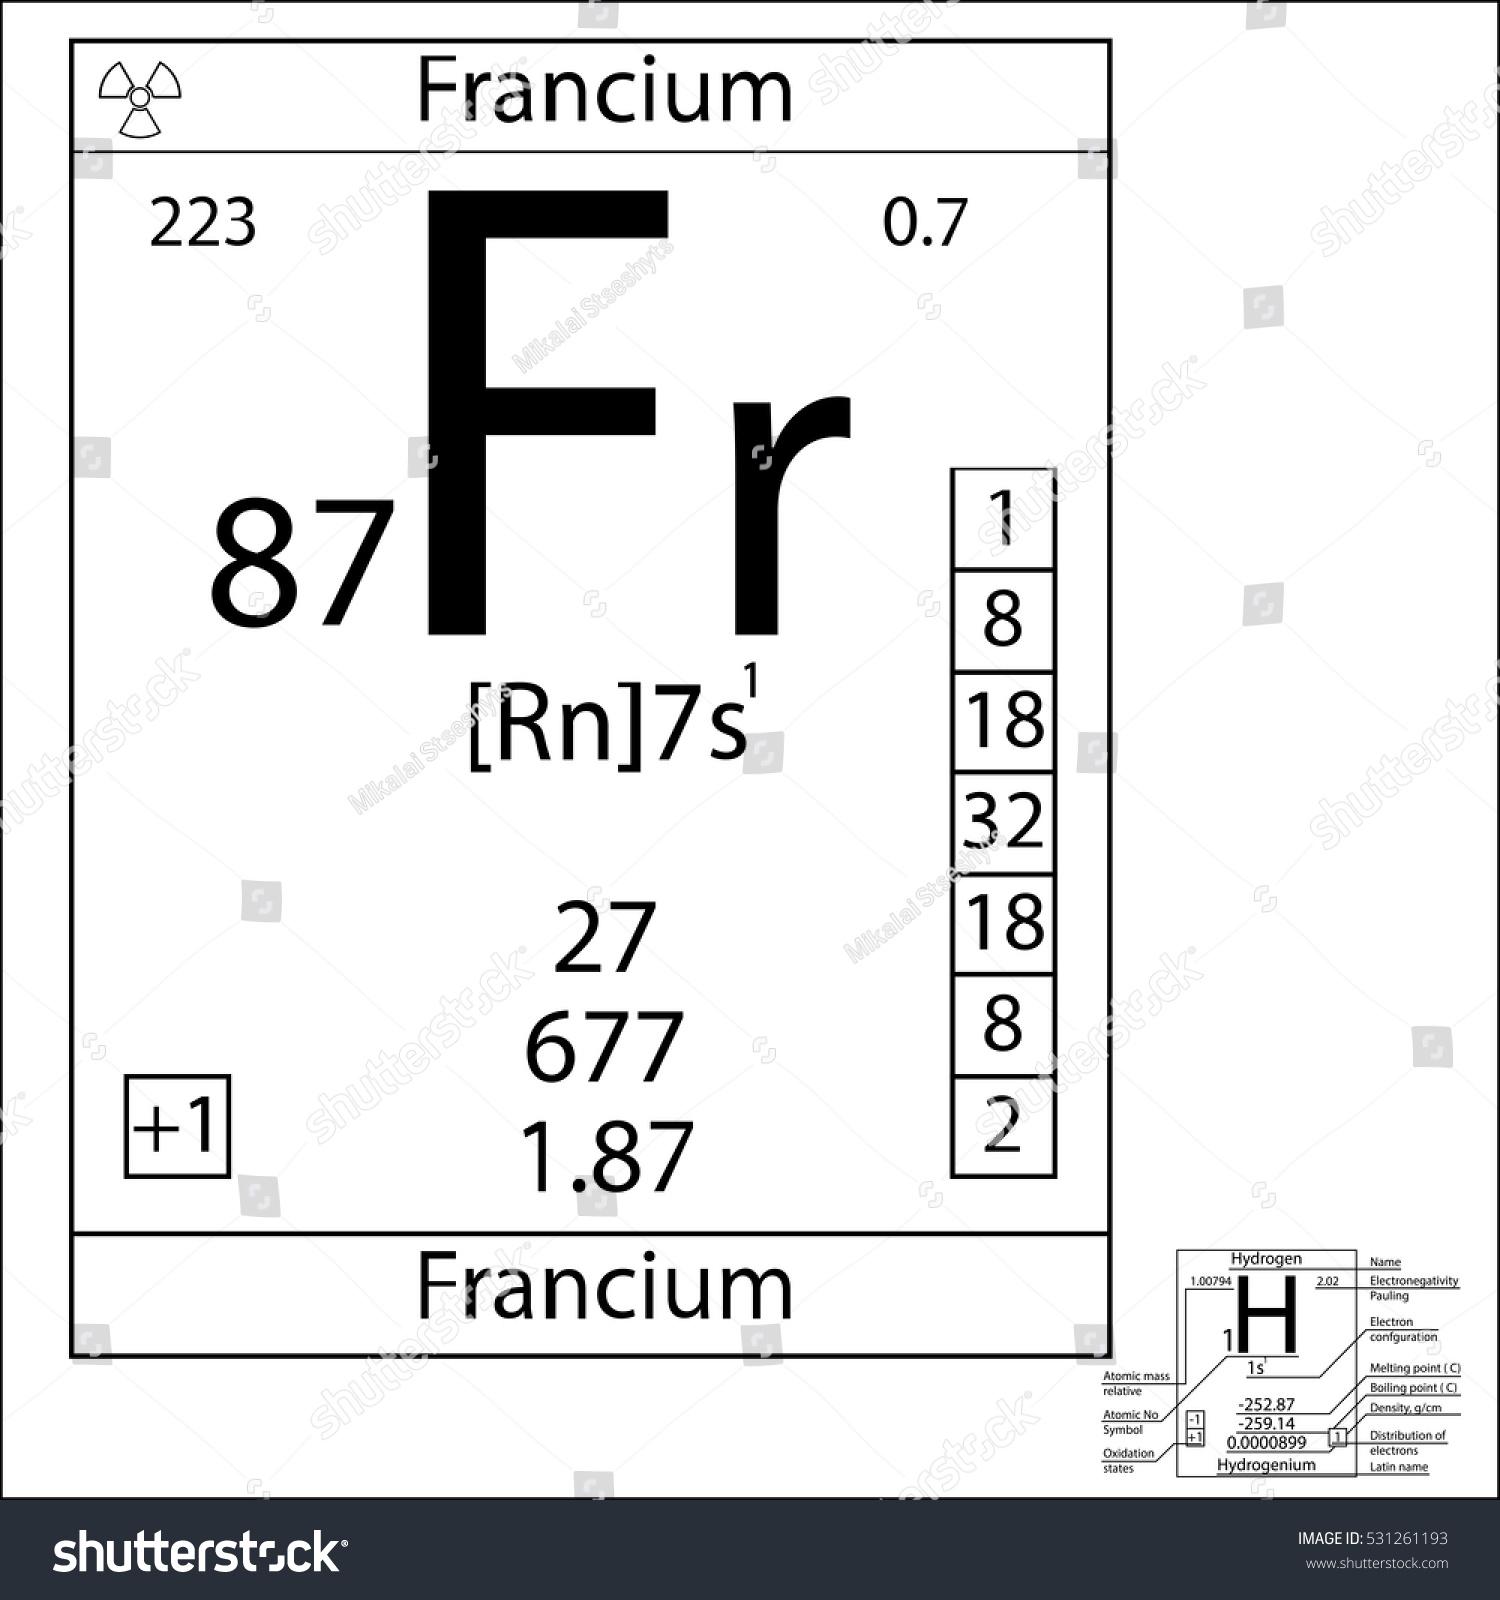 Periodic table element francium basic properties stock vector the periodic table element francium with the basic properties urtaz Choice Image